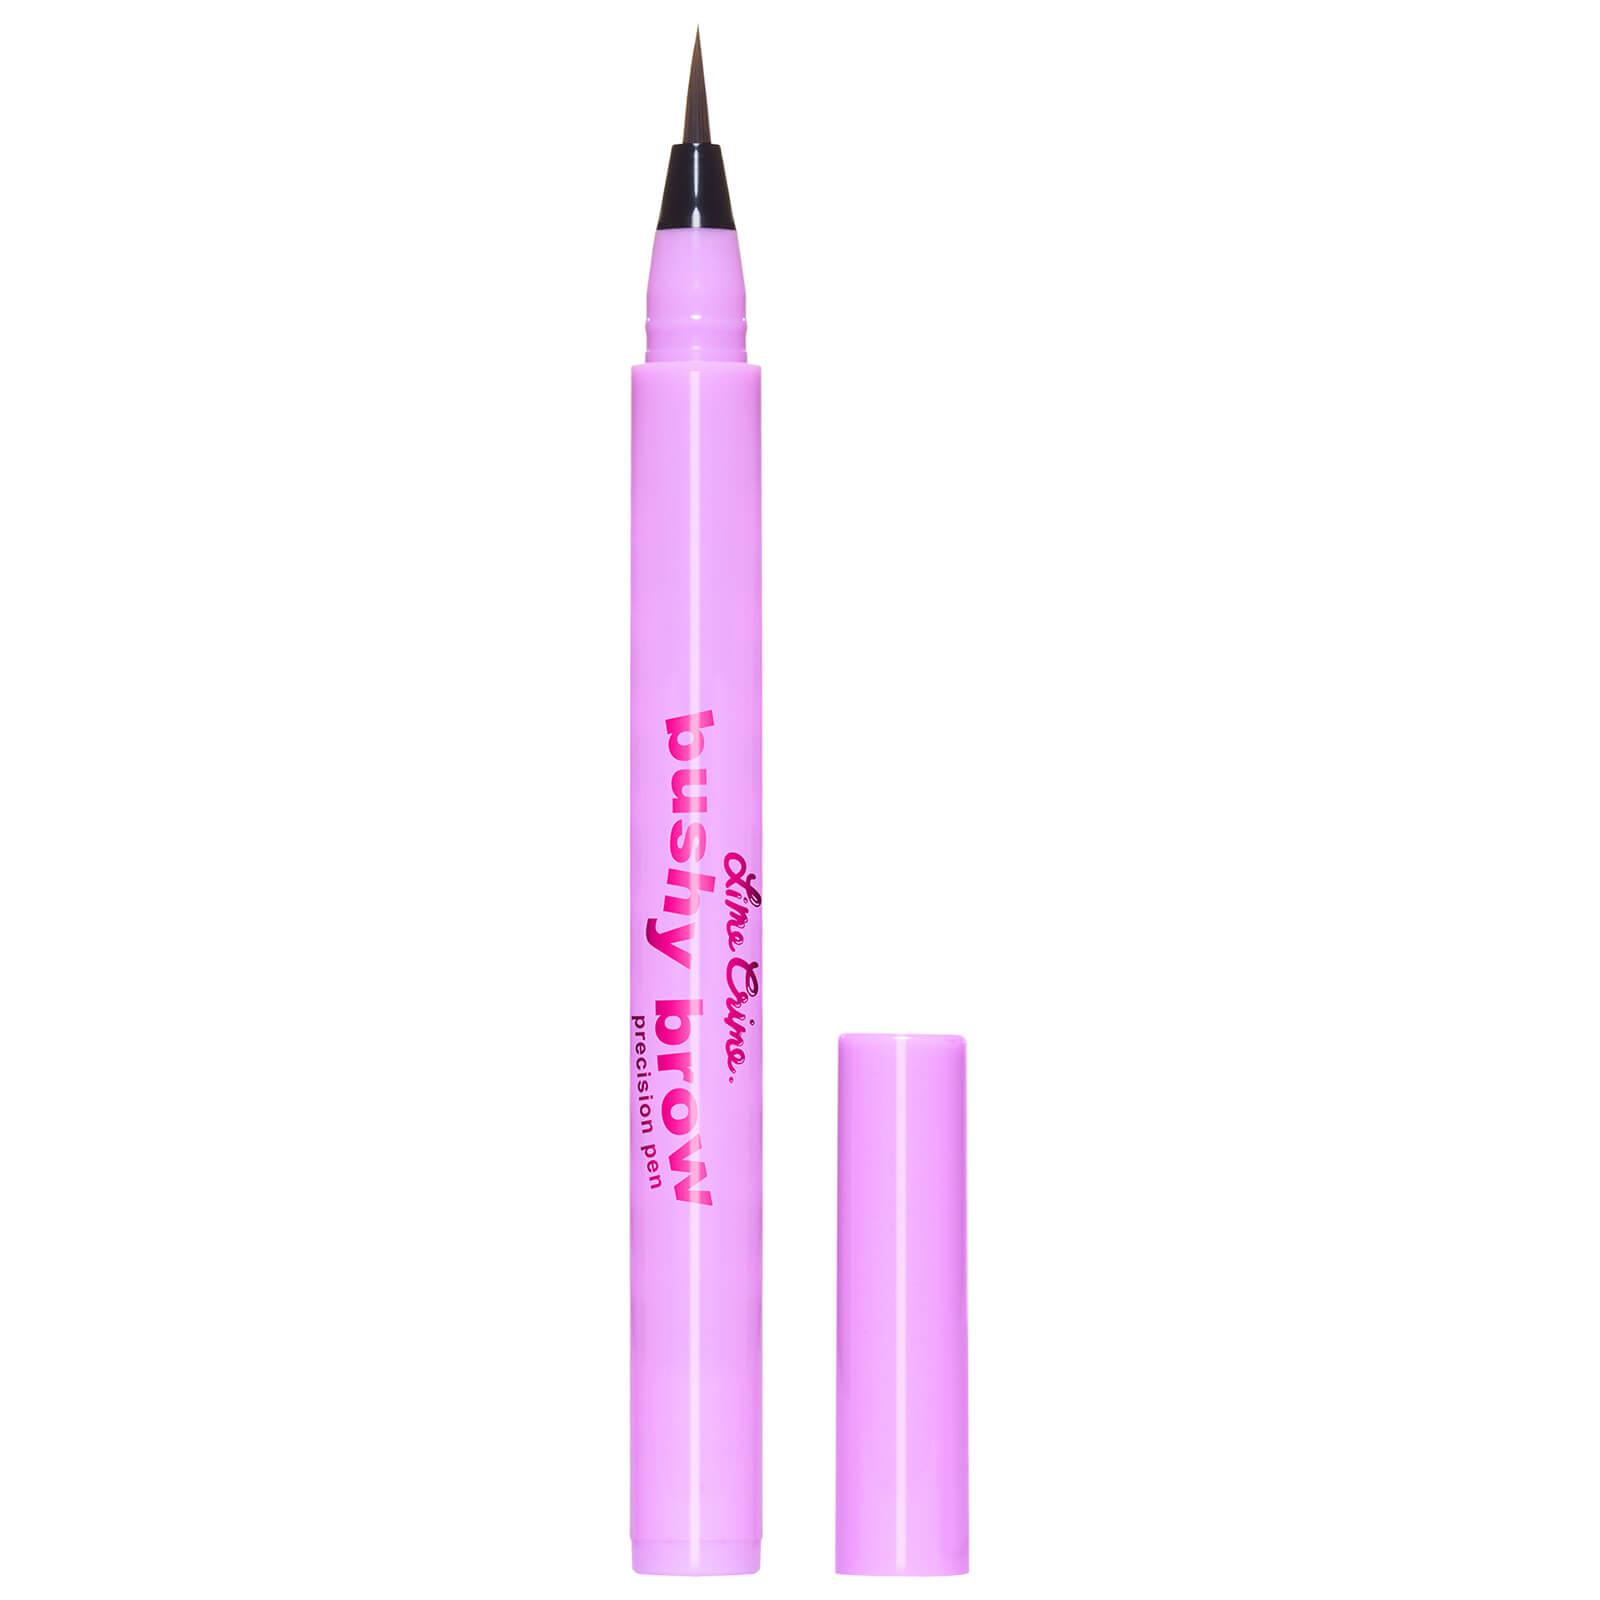 Lime Crime Bushy Brow Pen 0.7ml (Various Shades) - Dirty Blonde